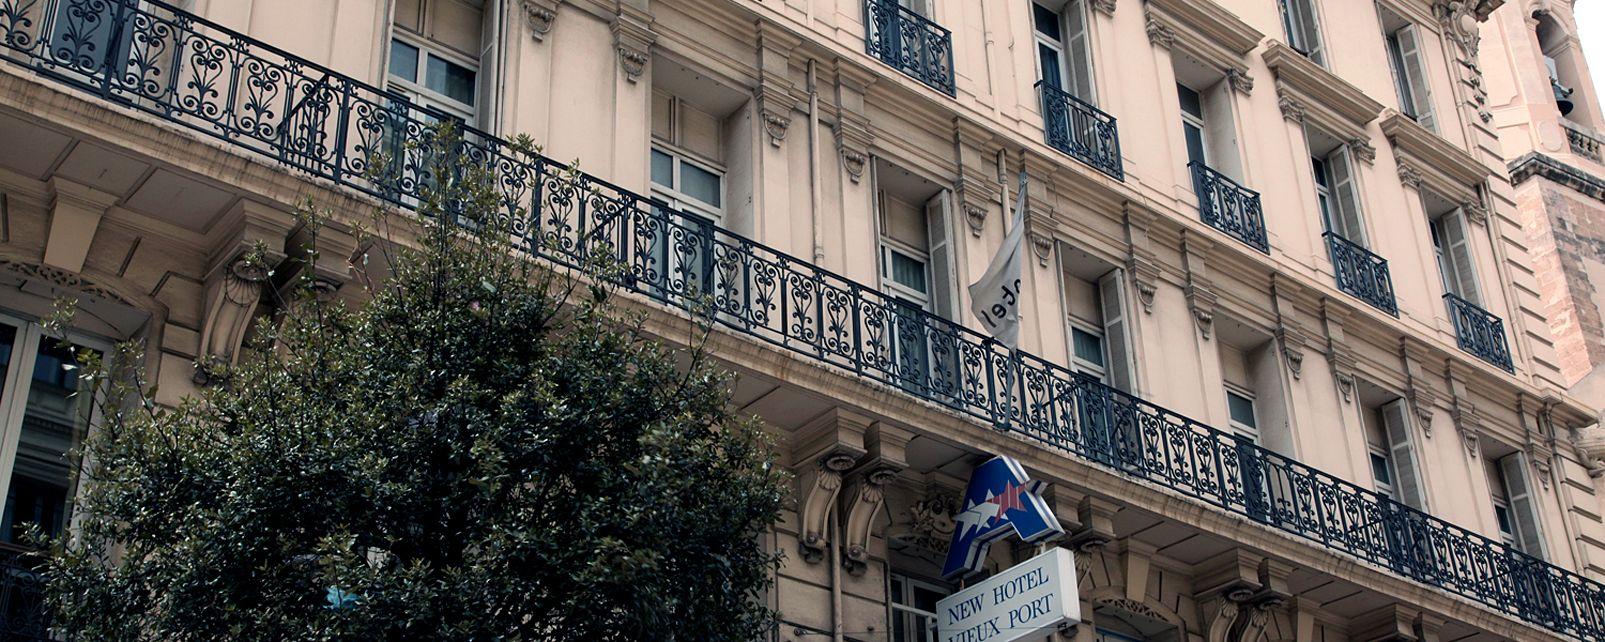 Hôtel New Hotel Vieux Port